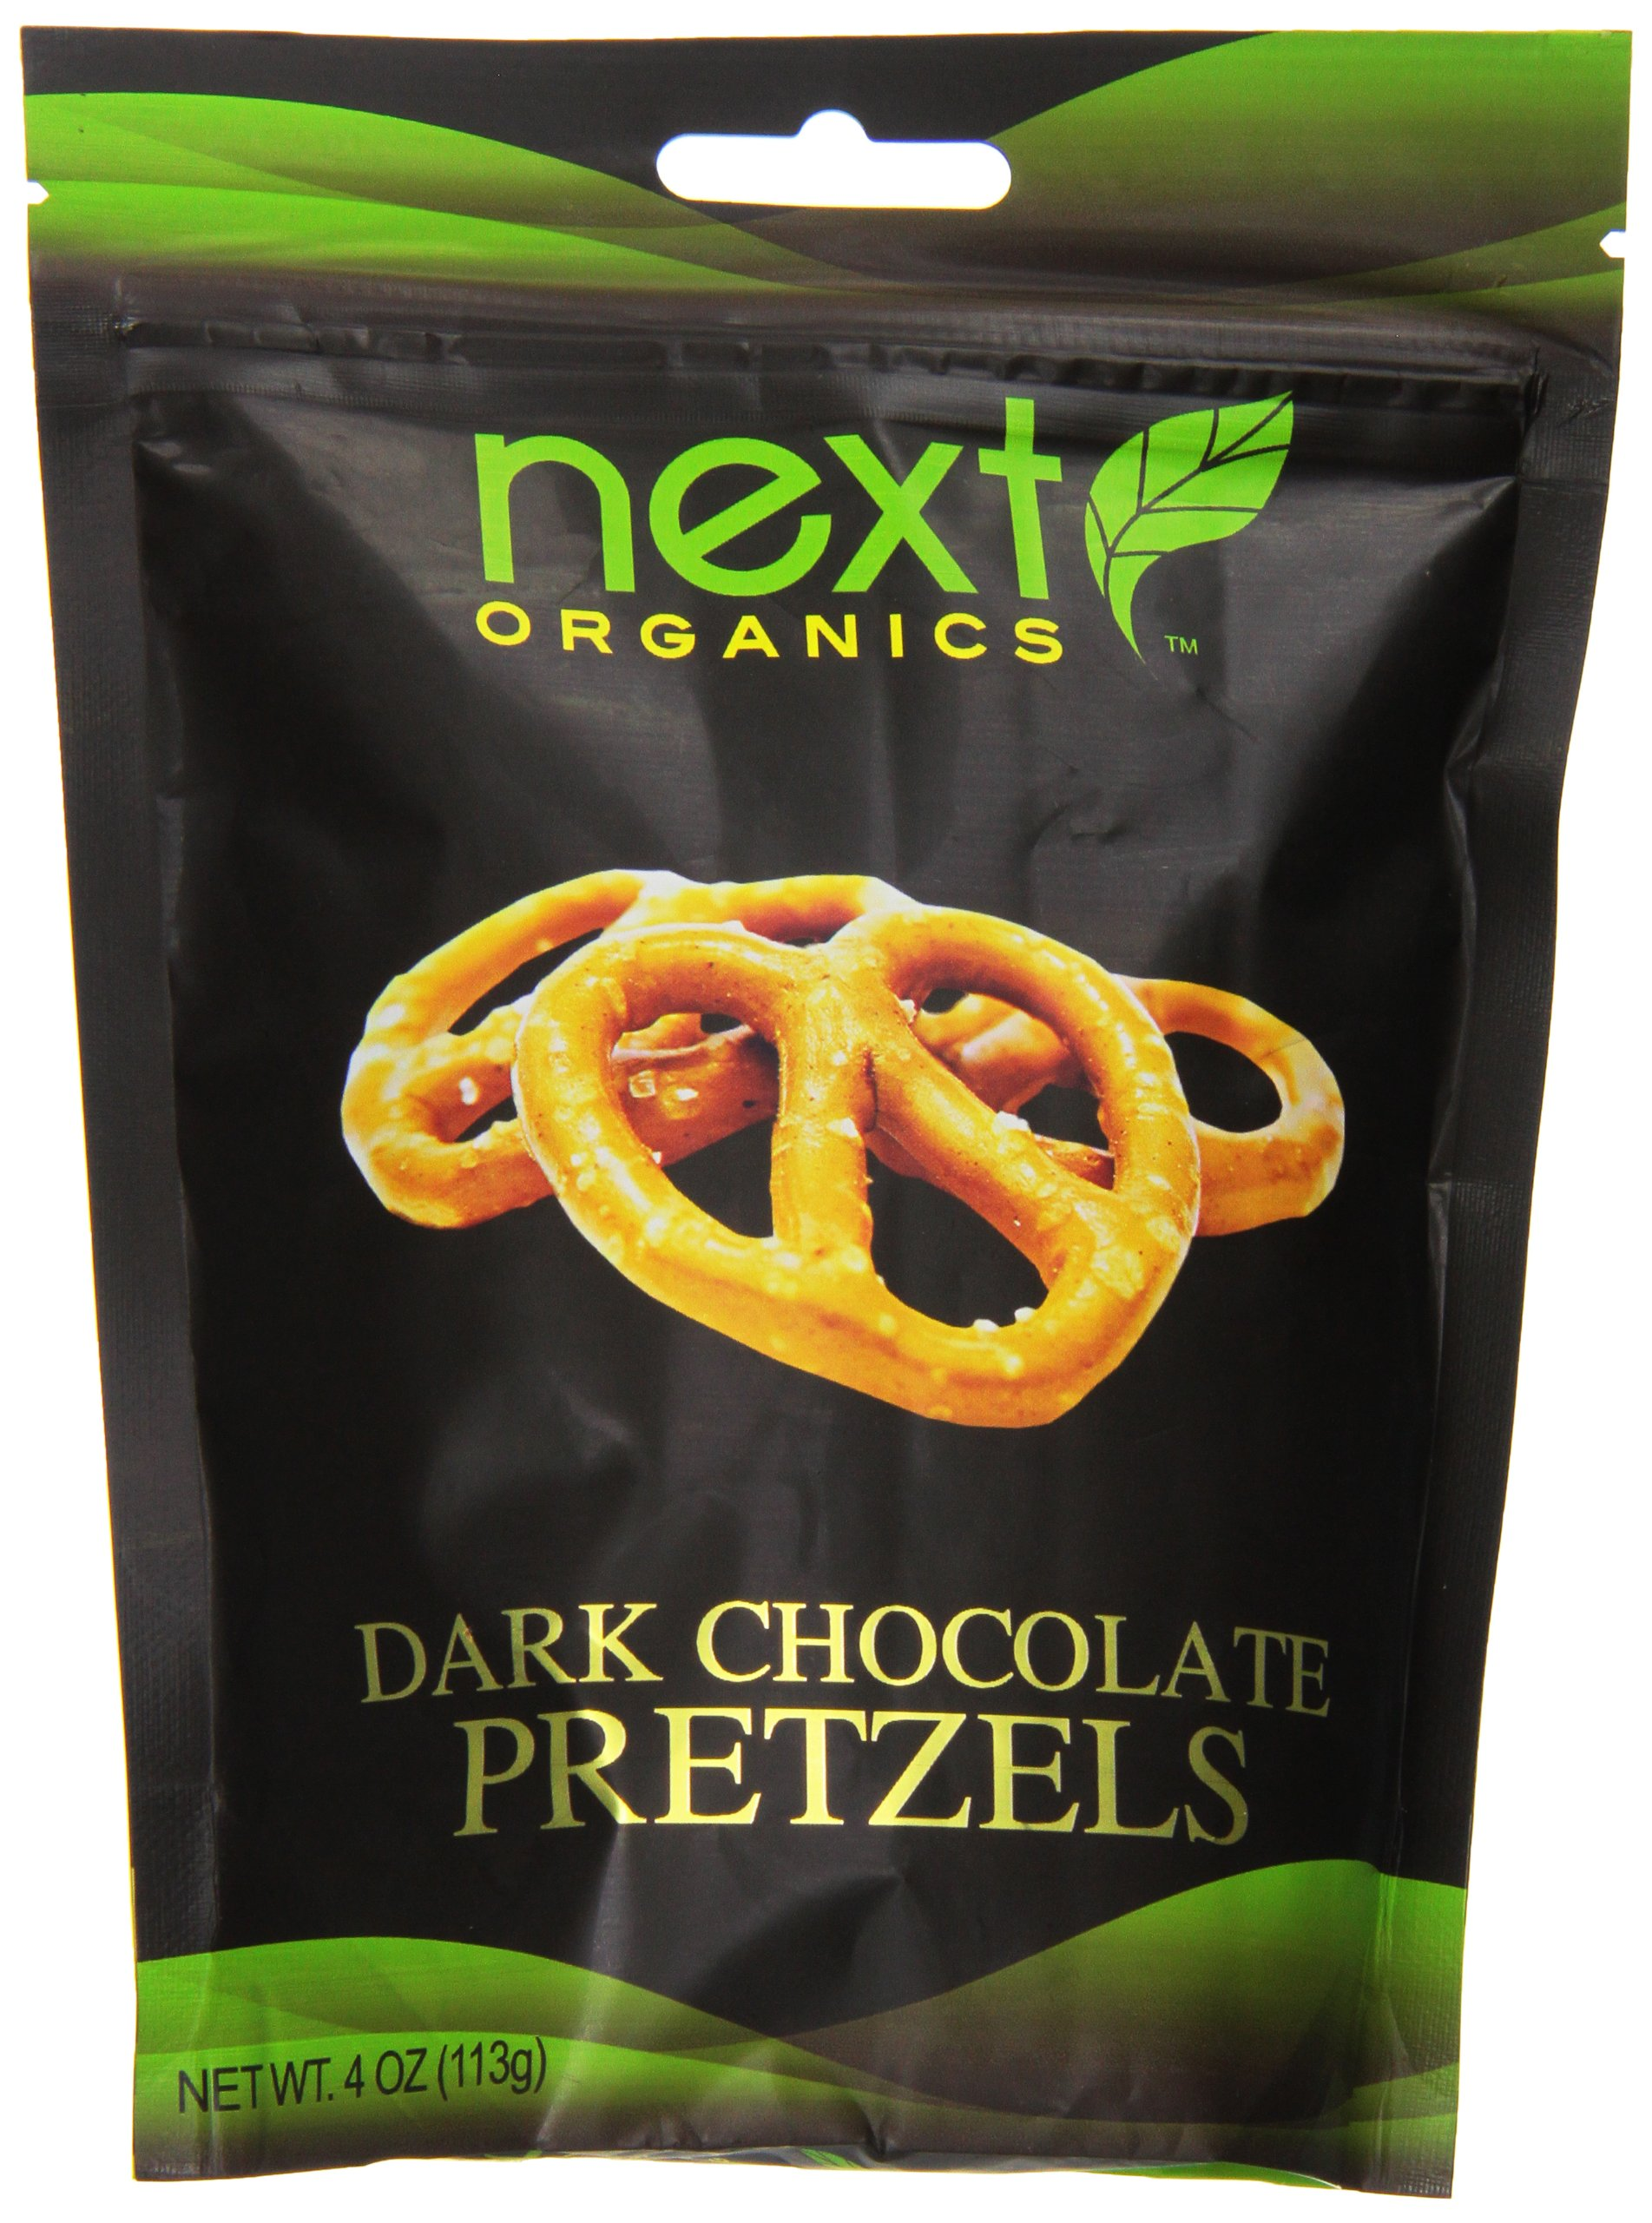 Next Organics Dark Chocolate Covered Pretzels, 4 Ounce by Next Organics